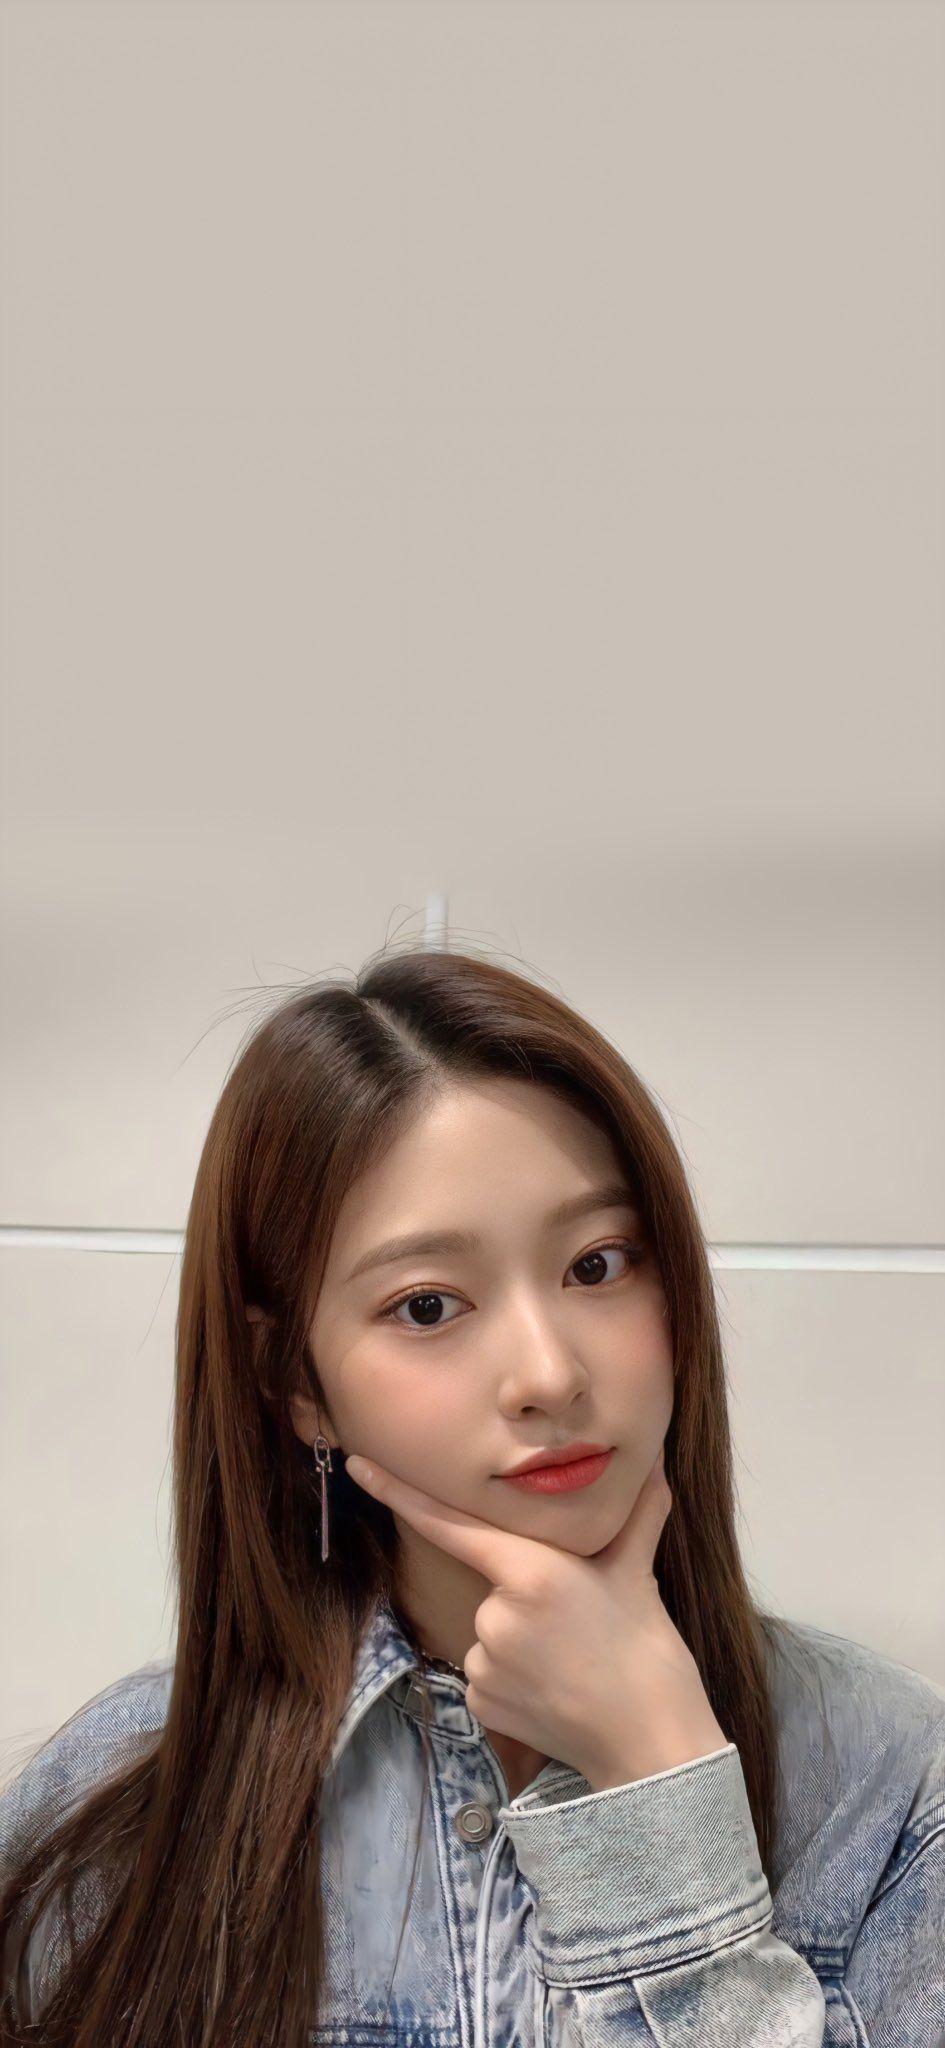 Iz One Wallpapers On Twitter Pretty Korean Girls Wallpaper Please Wallpaper